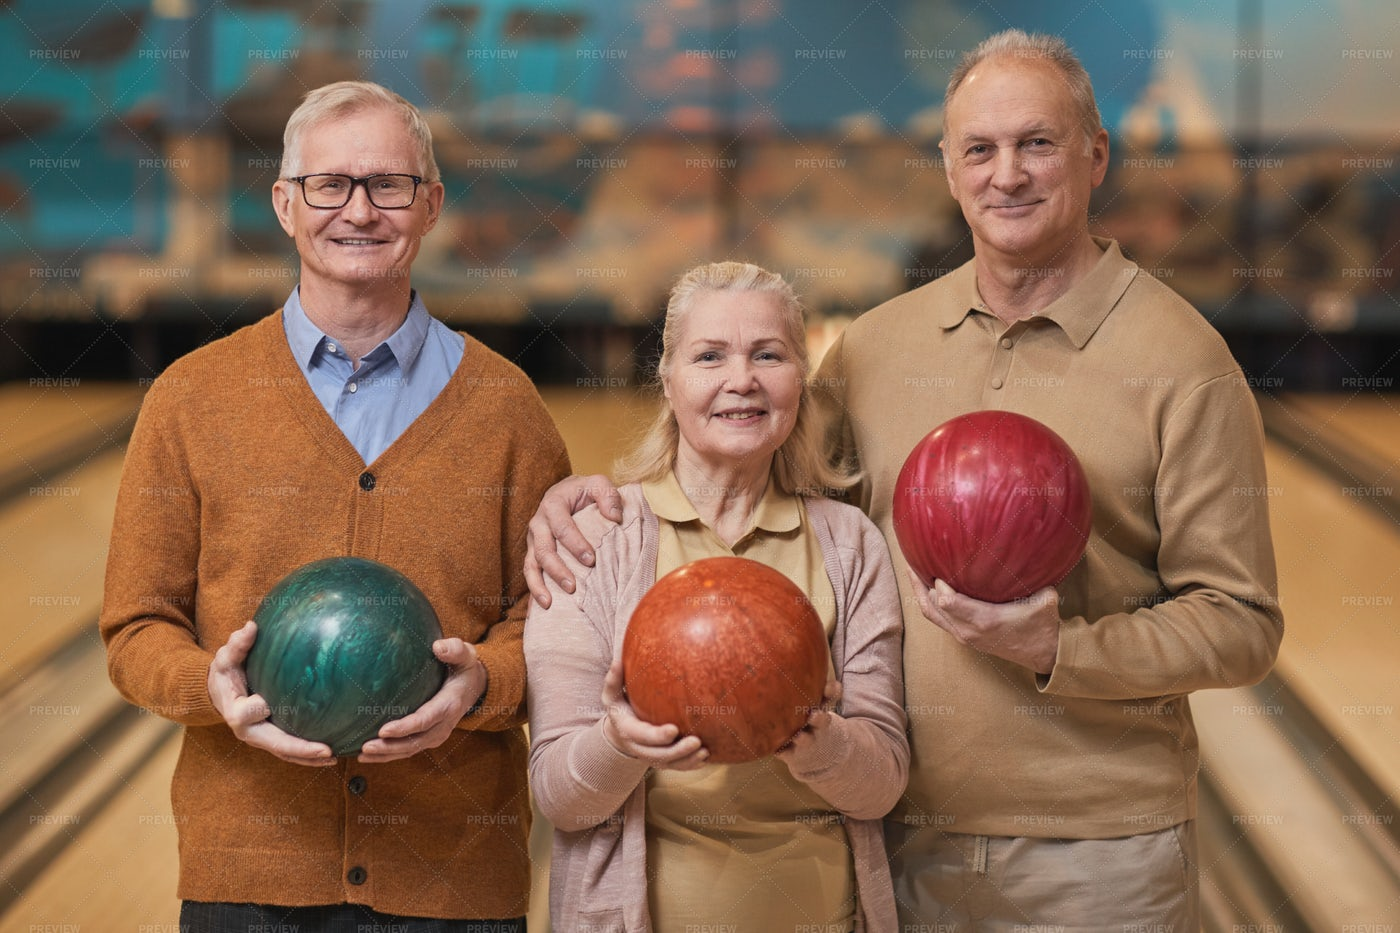 Senior Posing With Bowling Balls: Stock Photos